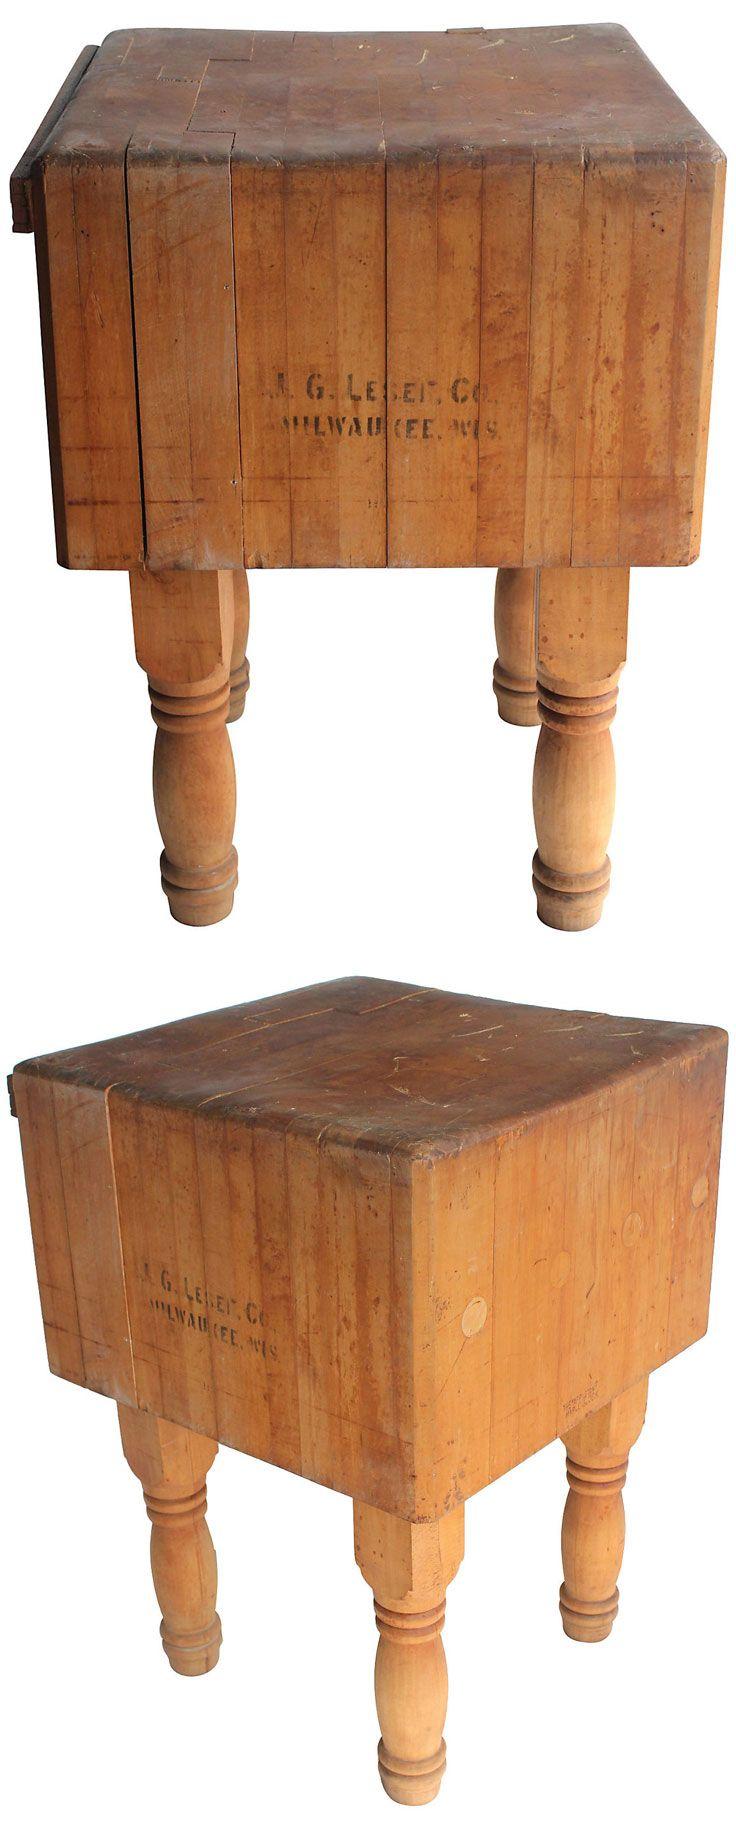 Love Maple Butcher Block Table Vintage 1269 Estimated Market Value 1900 25 L X 24 5 W 34 H Style Farm Rustic French